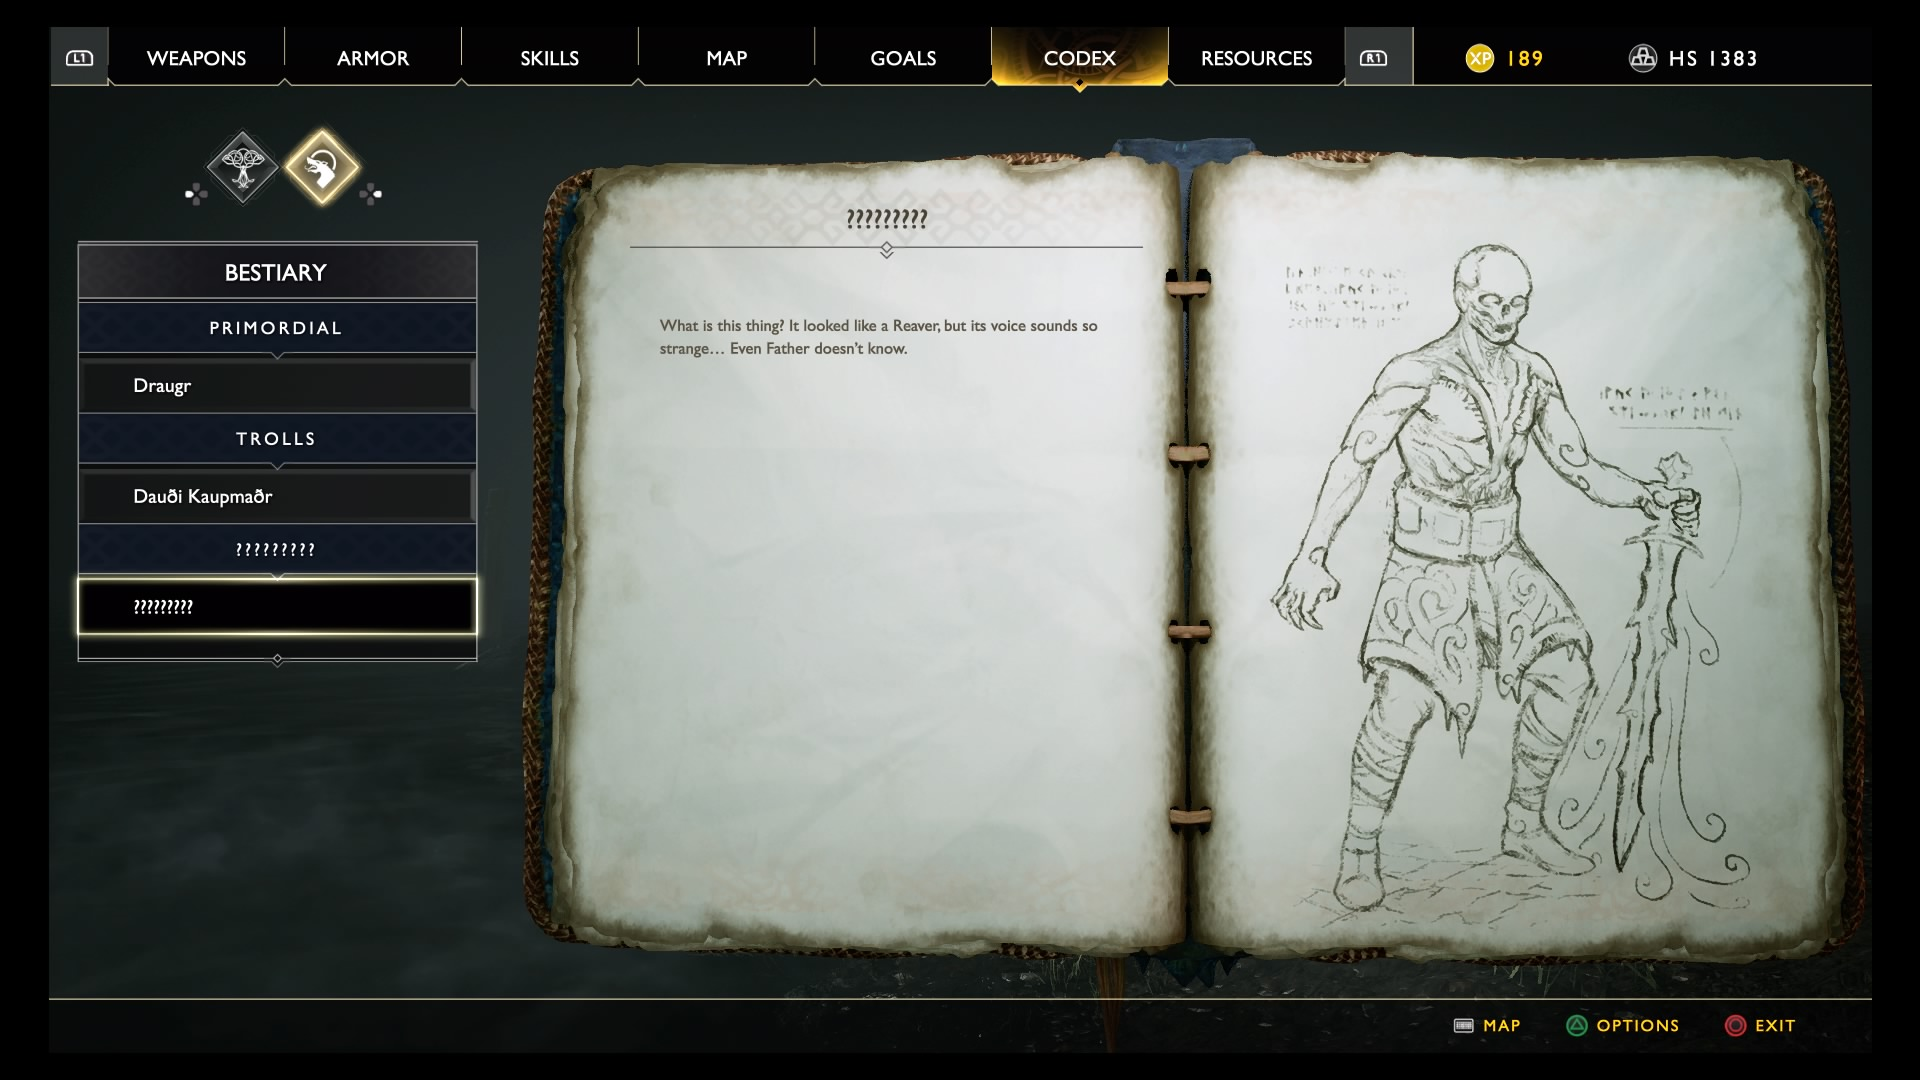 God of War Bestiary